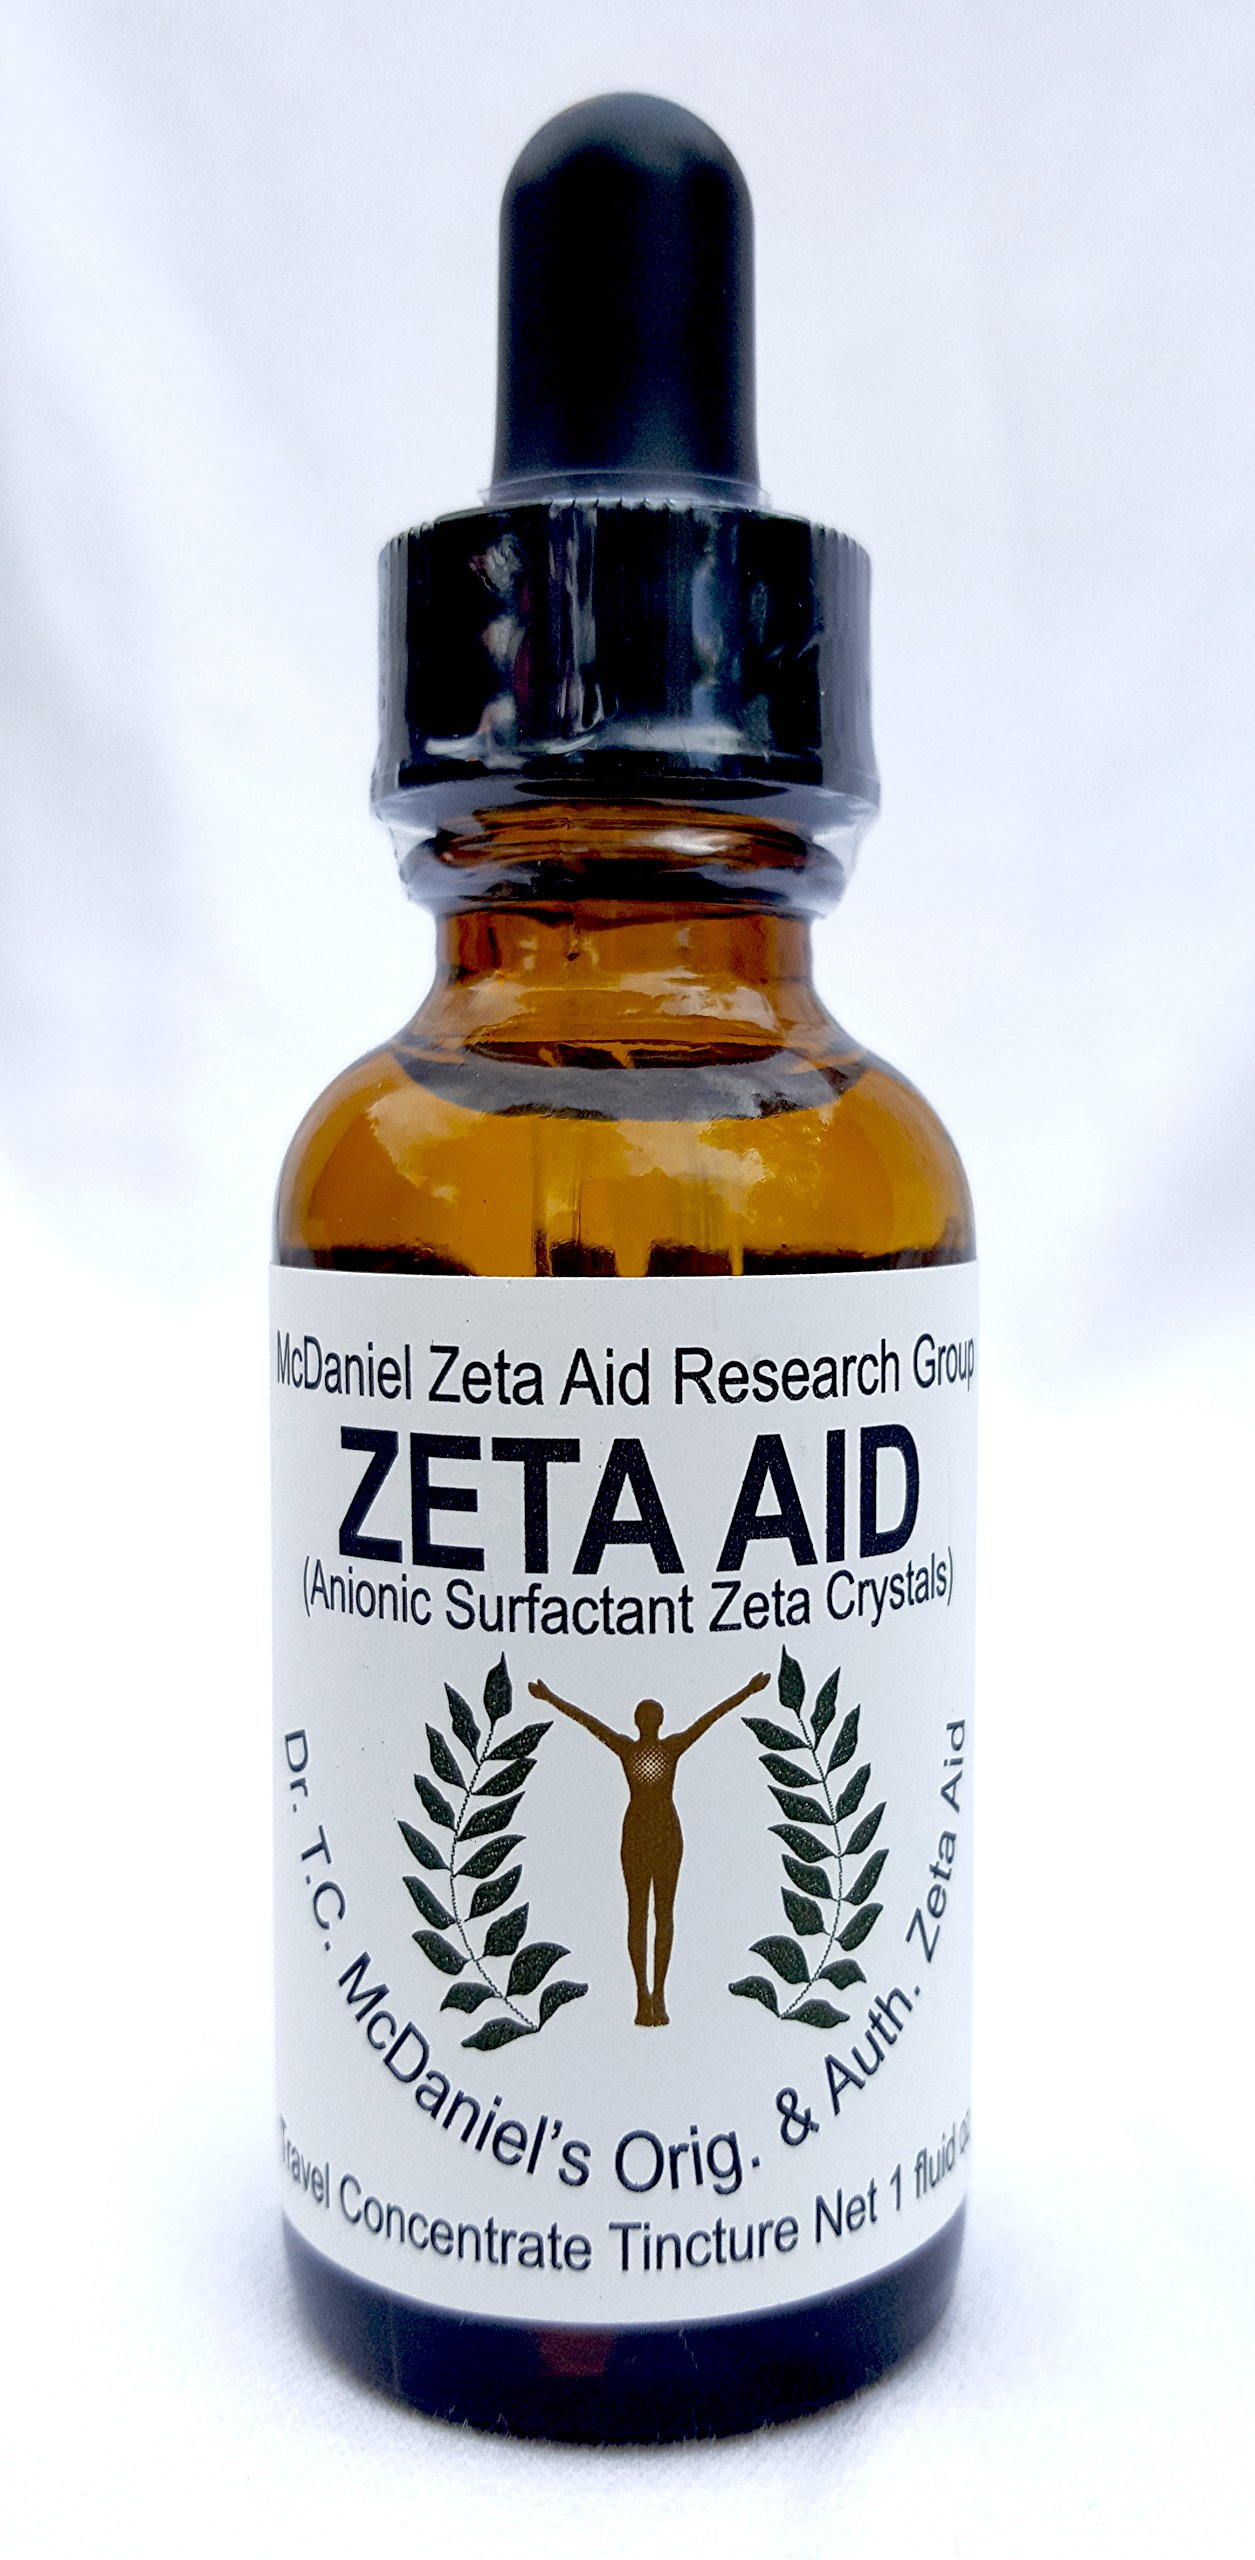 Zeta Aid Tincture - Dr. TC McDaniel's Original And Authorized Zeta Aid - 1 oz Travel Bottle